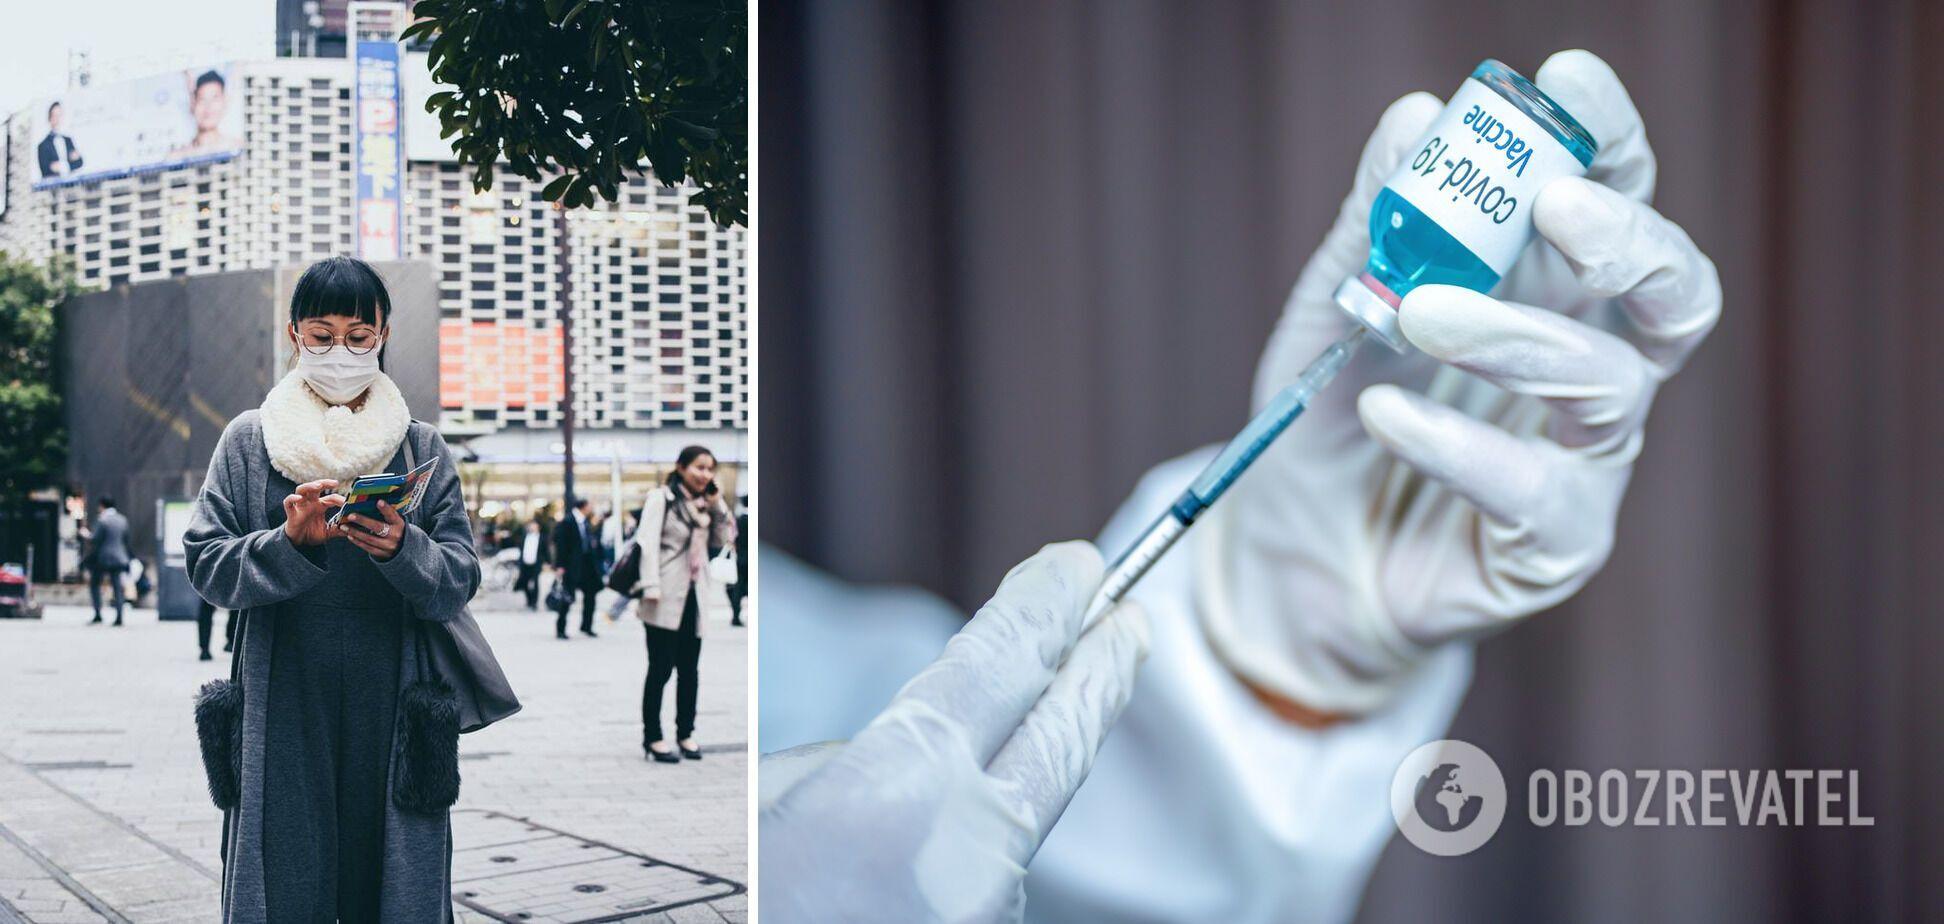 Японцам будут делать бустерную прививку против COVID-19